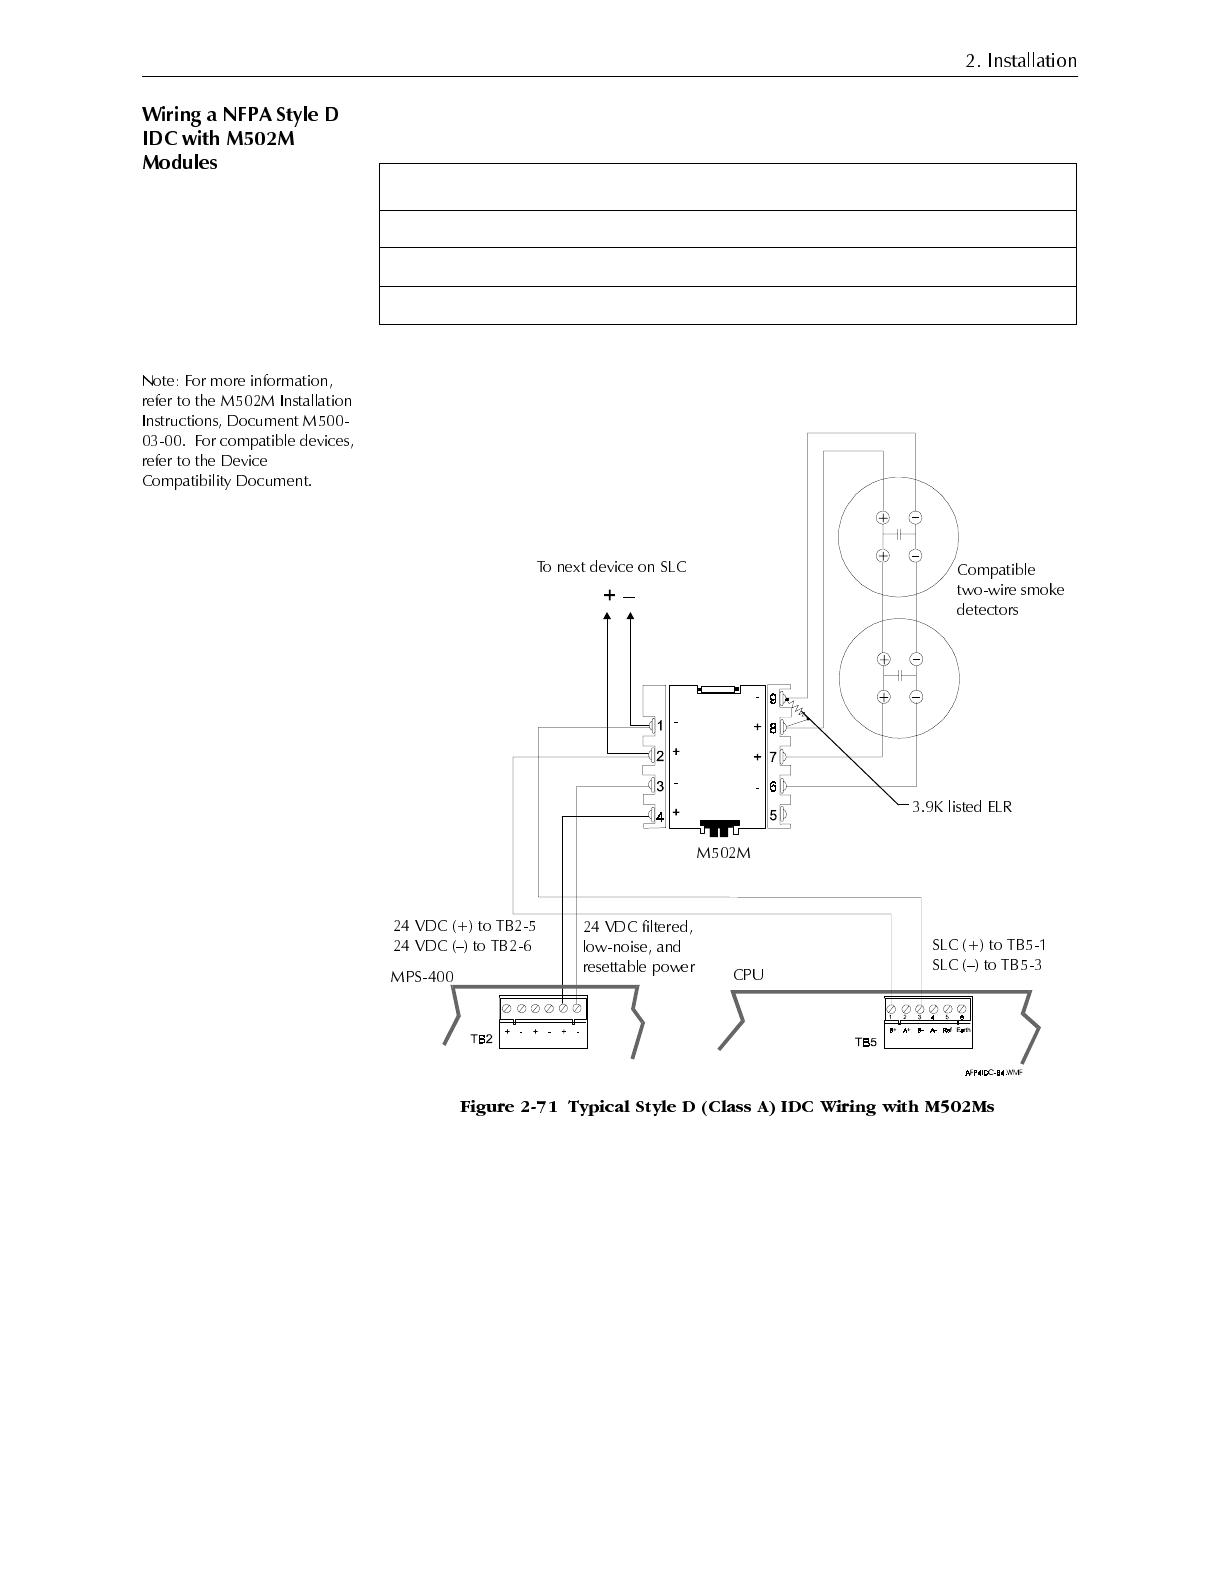 Aun40ia0 50710 Daisy Chain Wiring Diagram Smoke Detectors A Signaling Line Circuit Slc